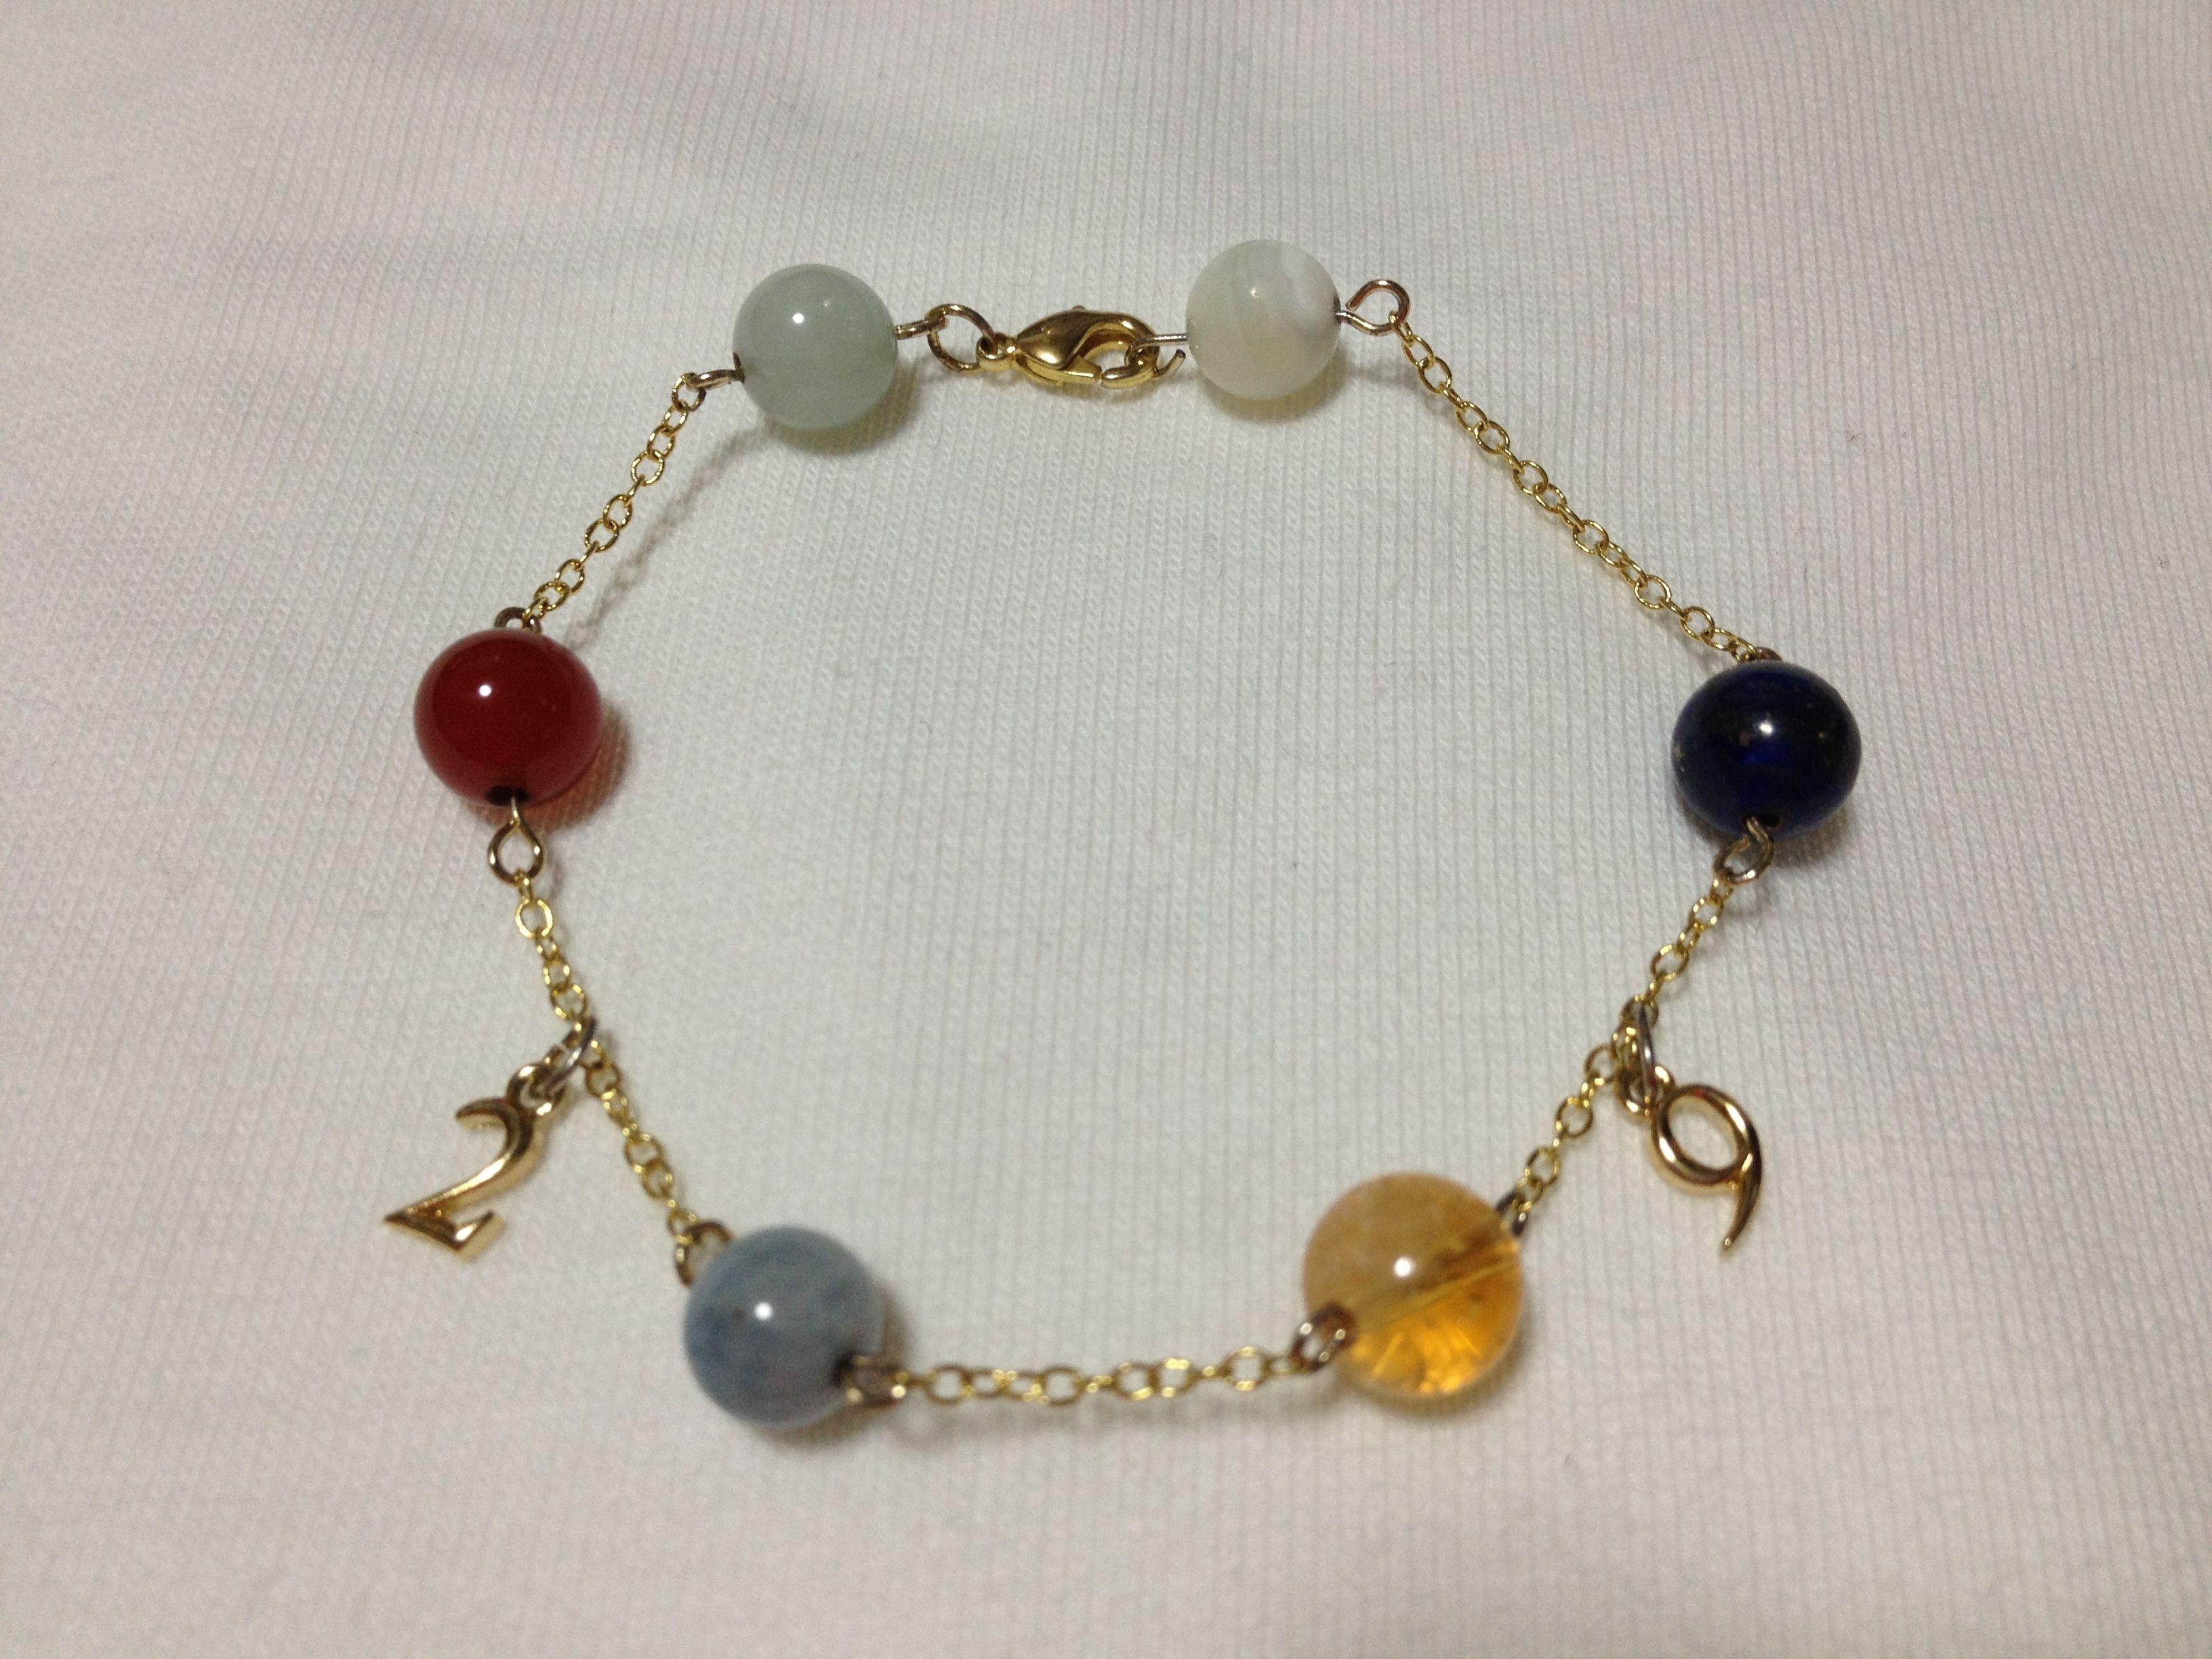 29/Shogo -A hand made bracelet with 2&9 charms!